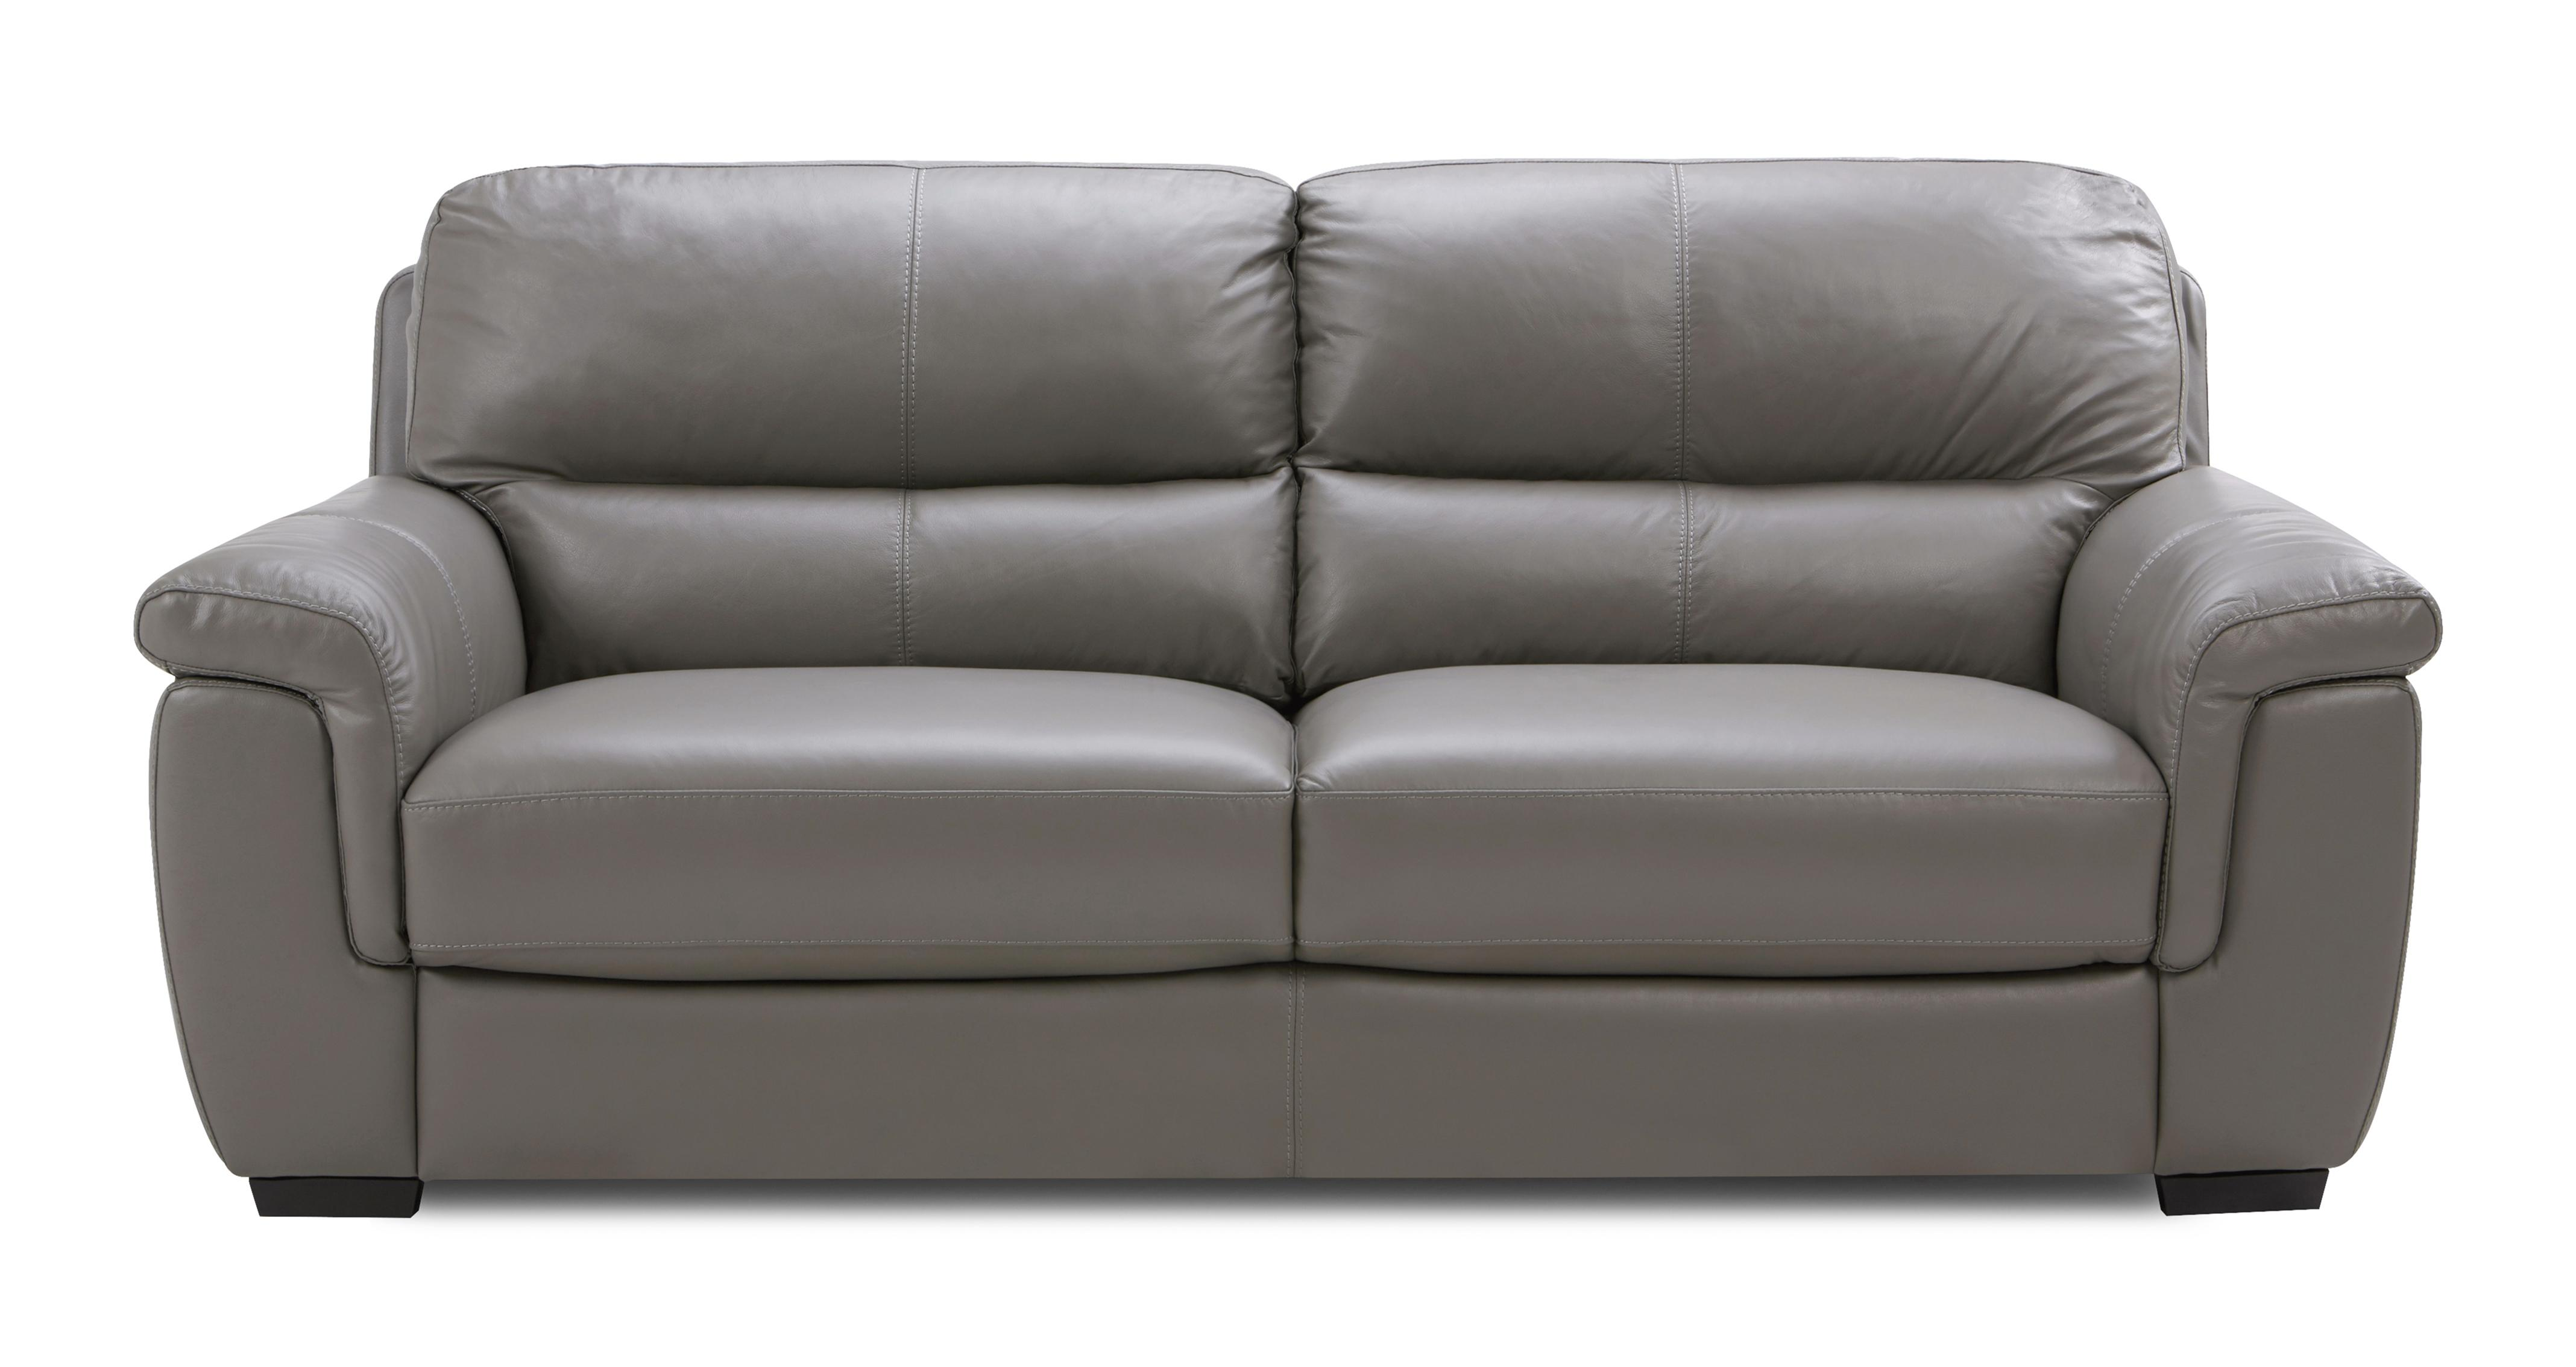 dfs sofas that come apart contemporary sofa beds design tula 3 seater premium